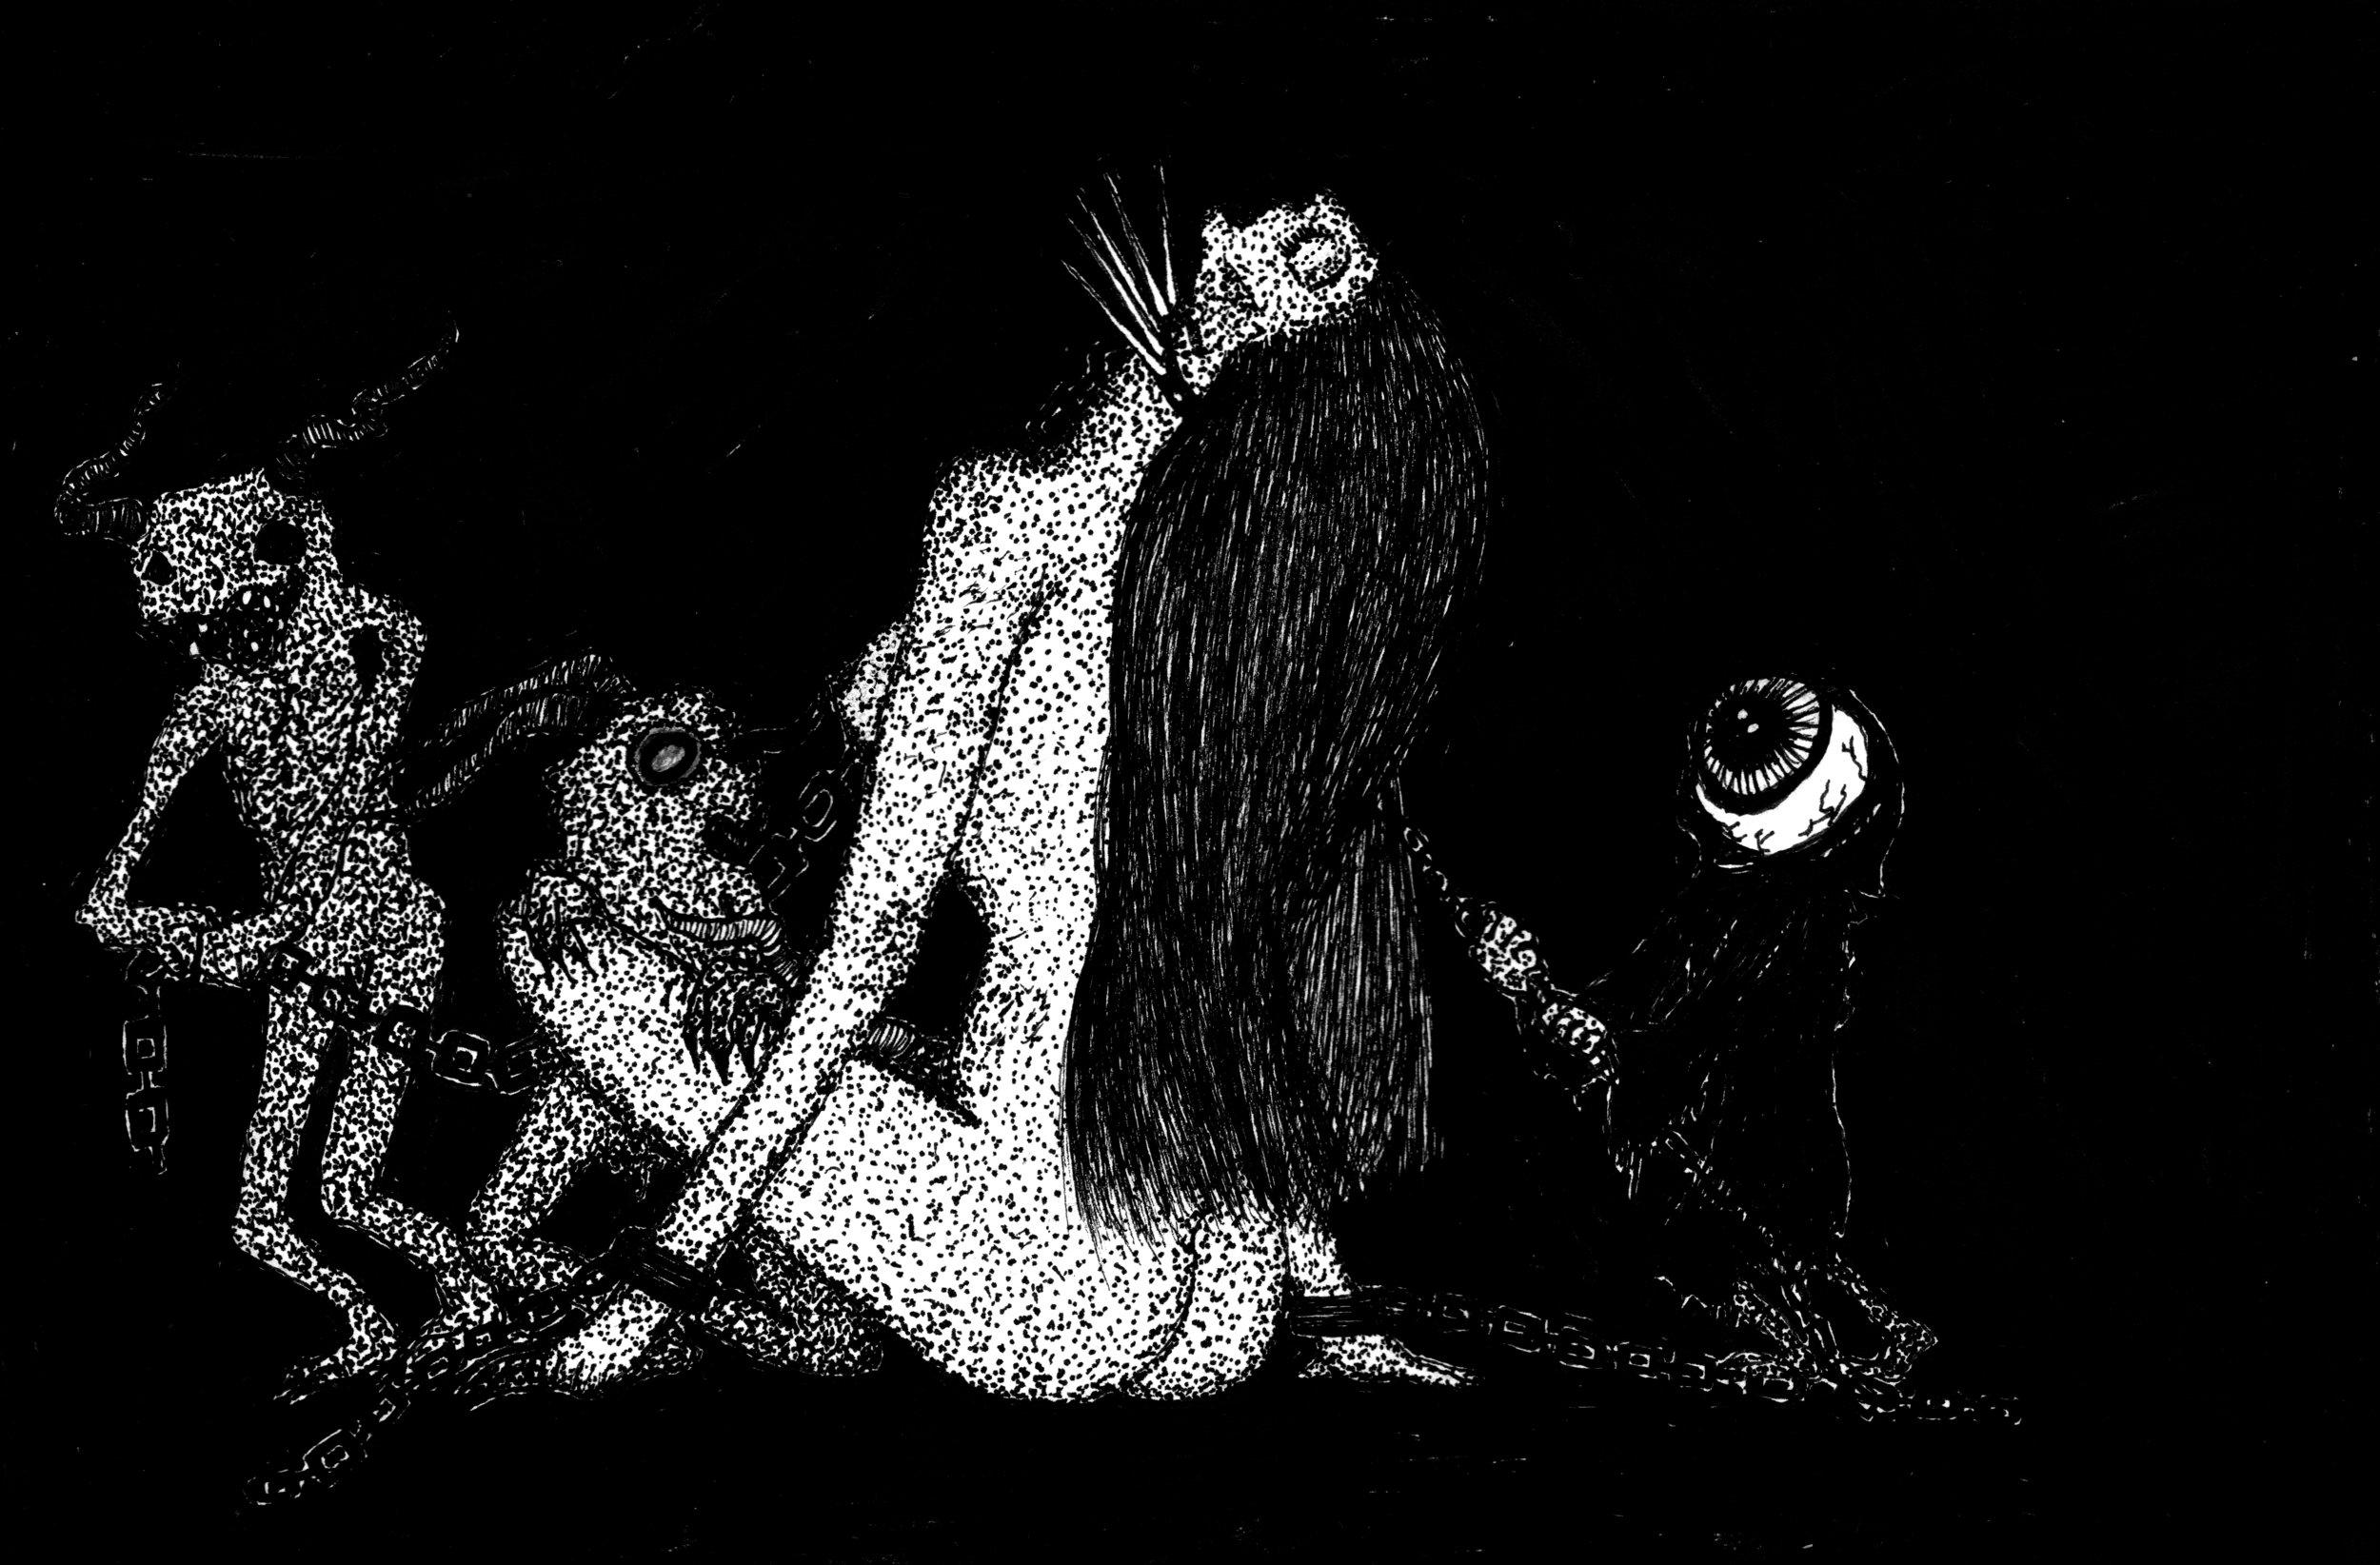 Desciples of Lilith Licking Rites Unto Virgin Flesh